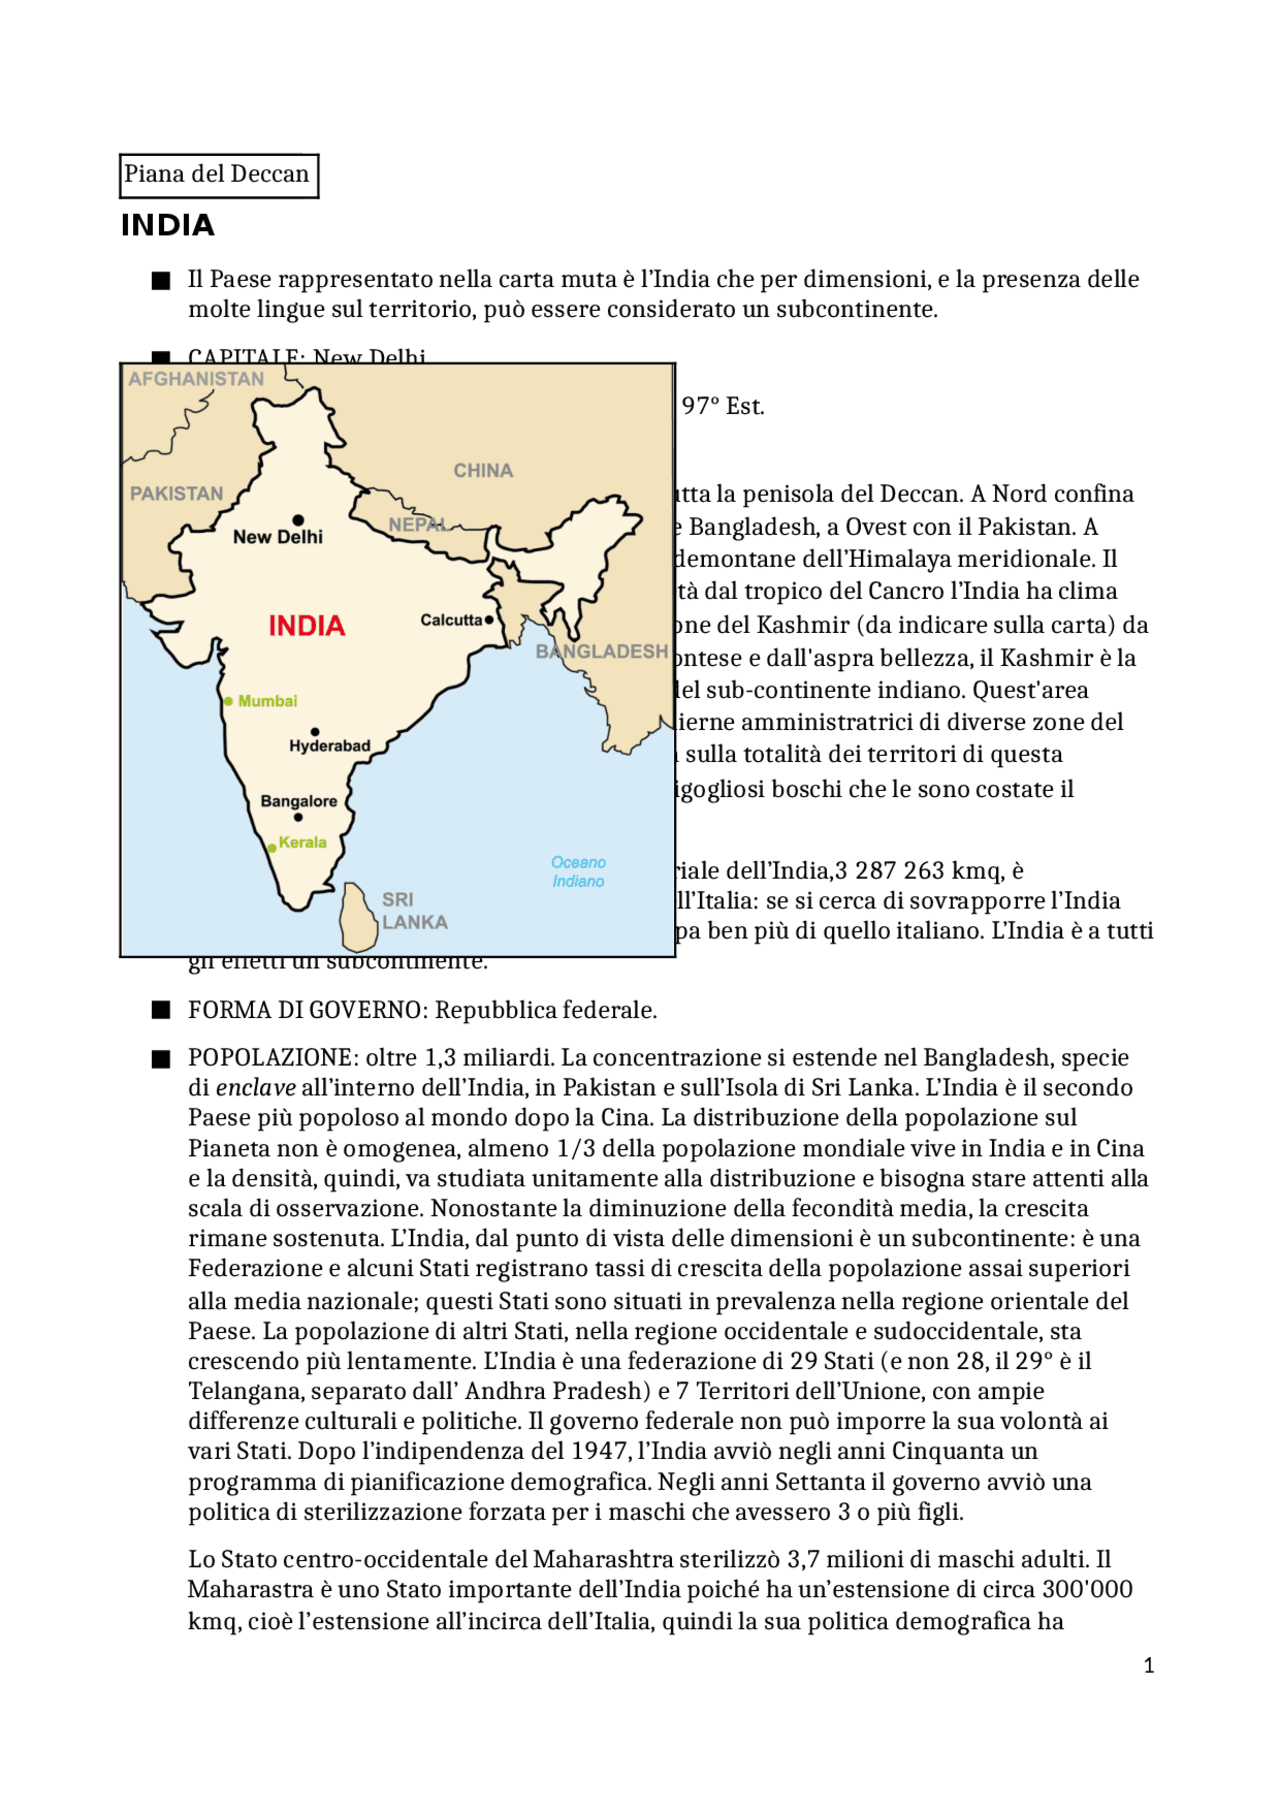 Cartina Muta Del Subcontinente Indiano.Analisi Geografica India Docsity